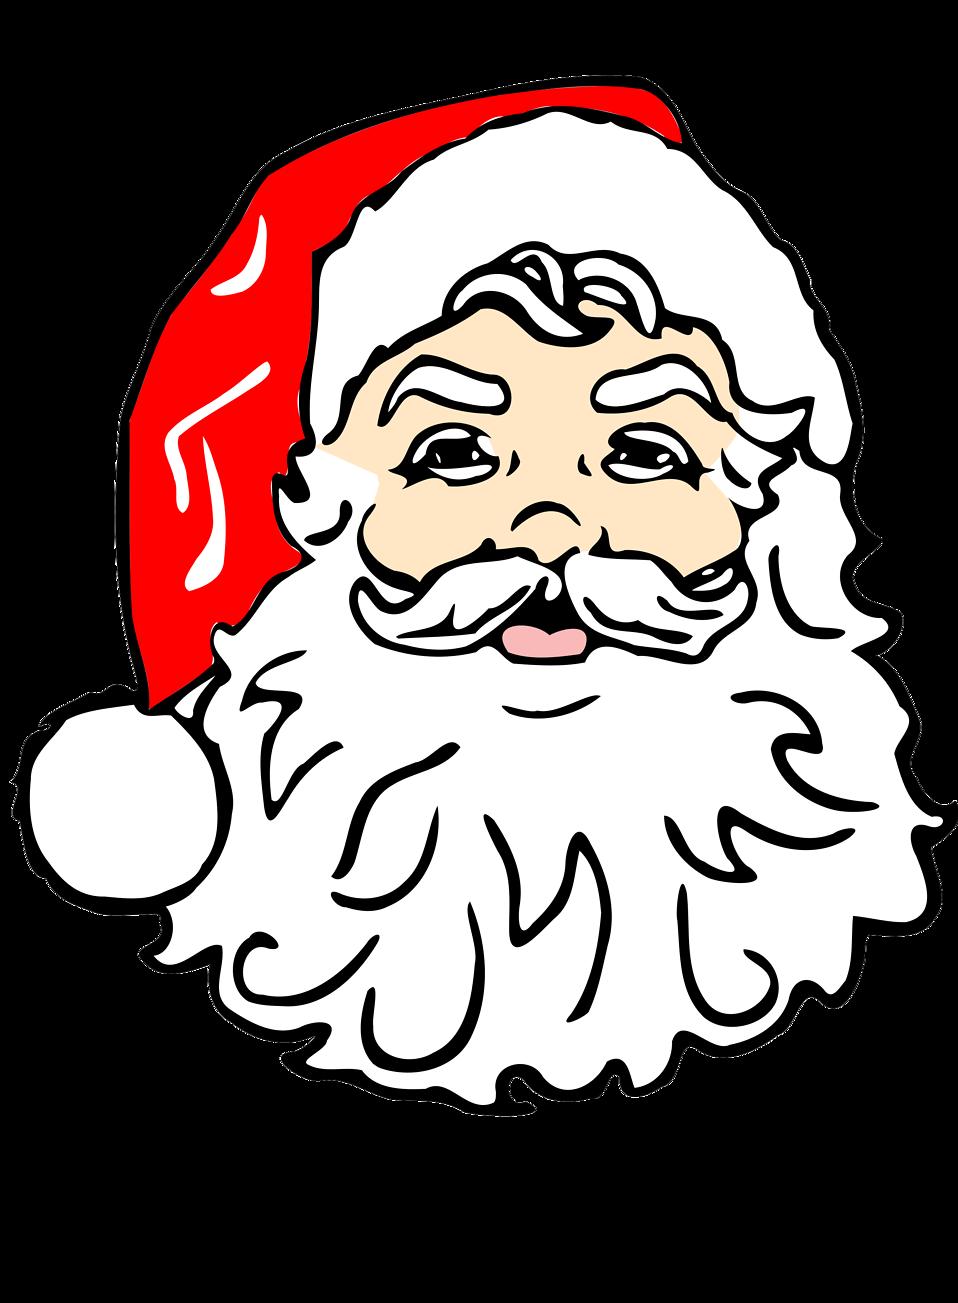 Face clipart santa claus. Free stock photo illustration